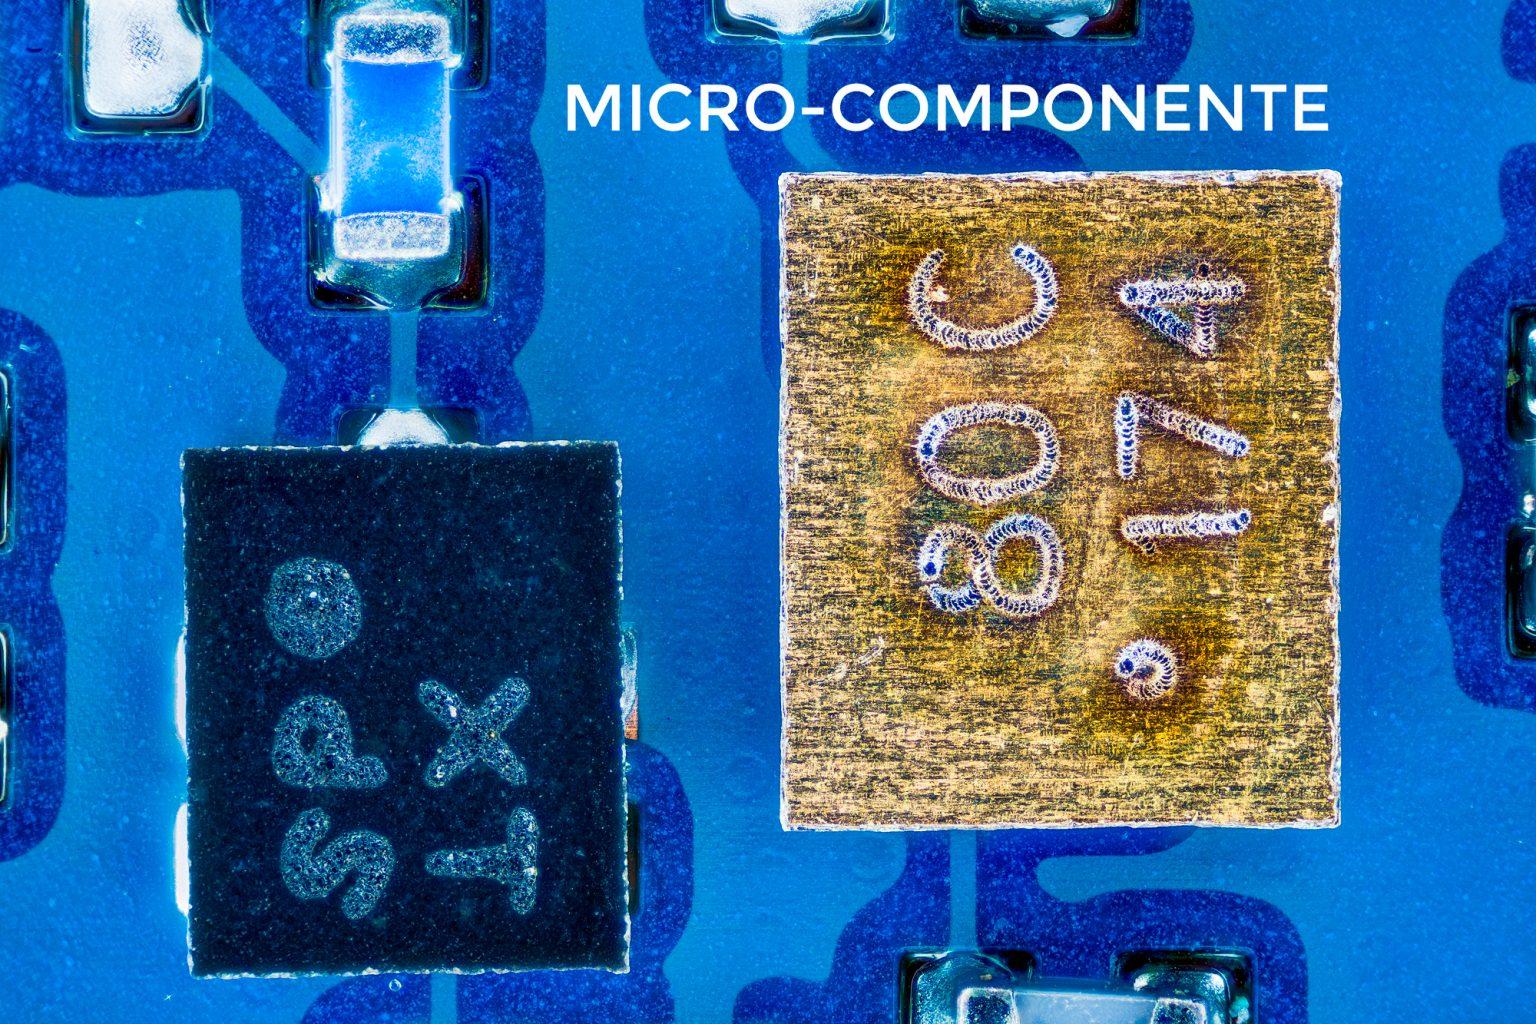 objetos microscópicos